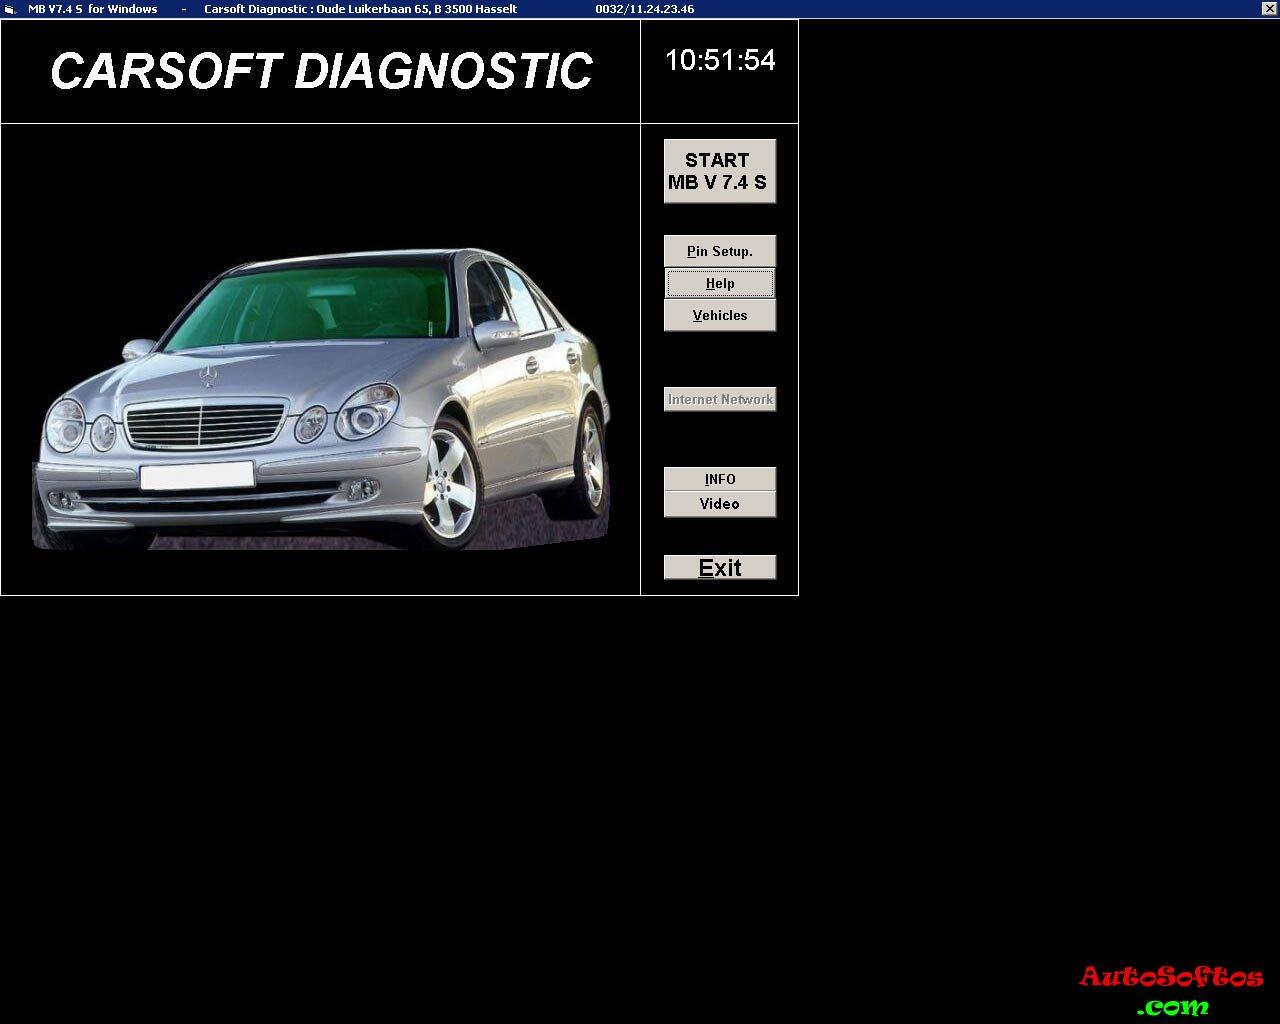 программа на ноутбук для диагностики авто